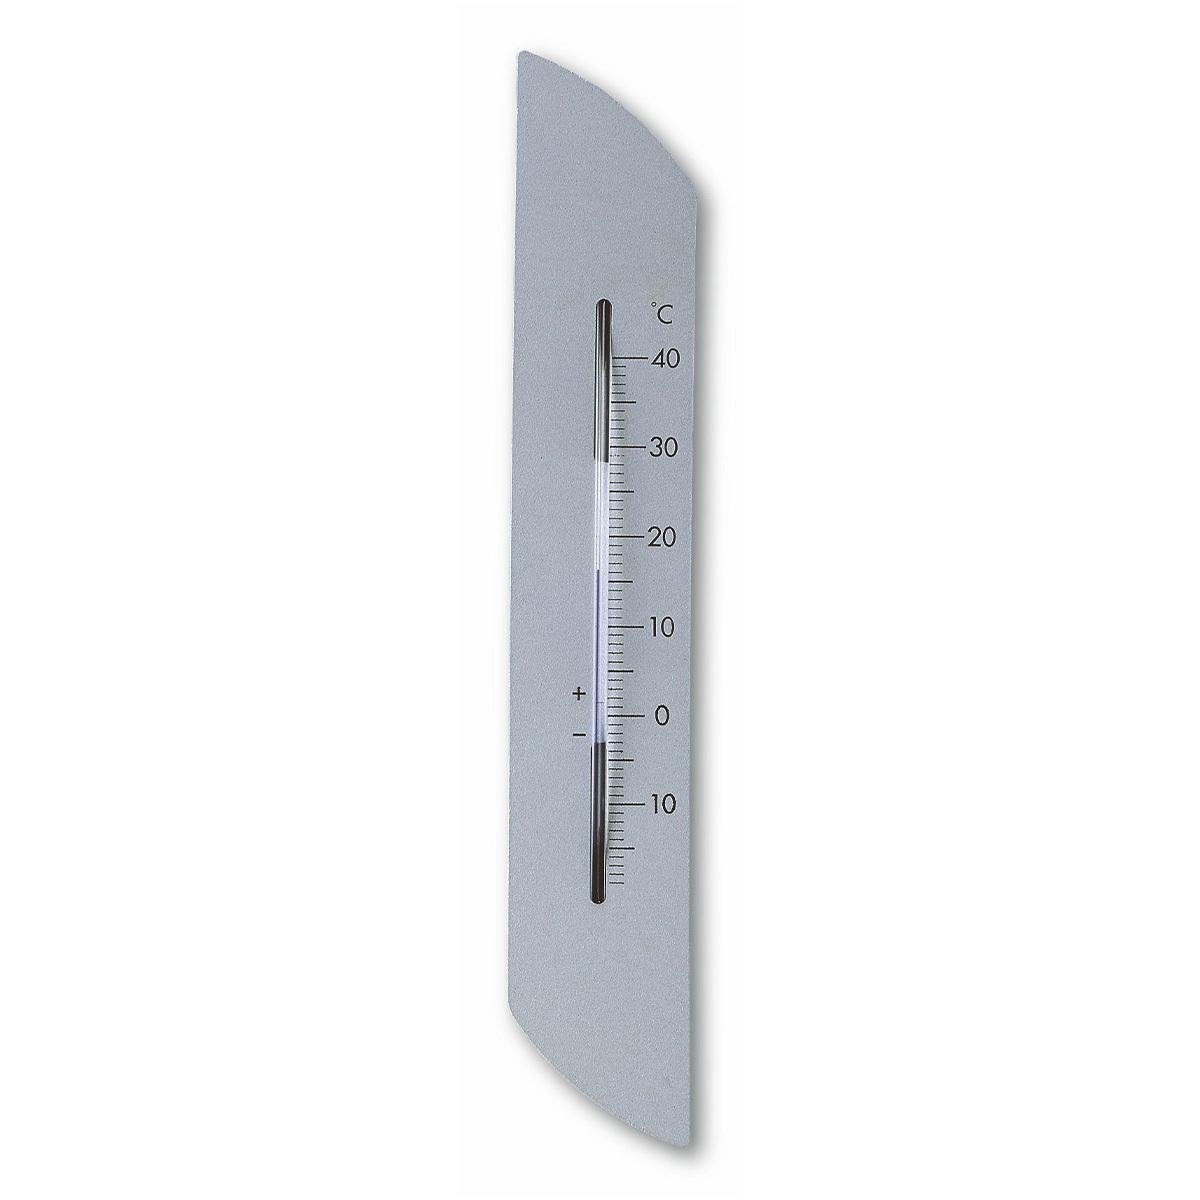 12-2031-analoges-innen-aussen-thermometer-metall-radius-1200x1200px.jpg